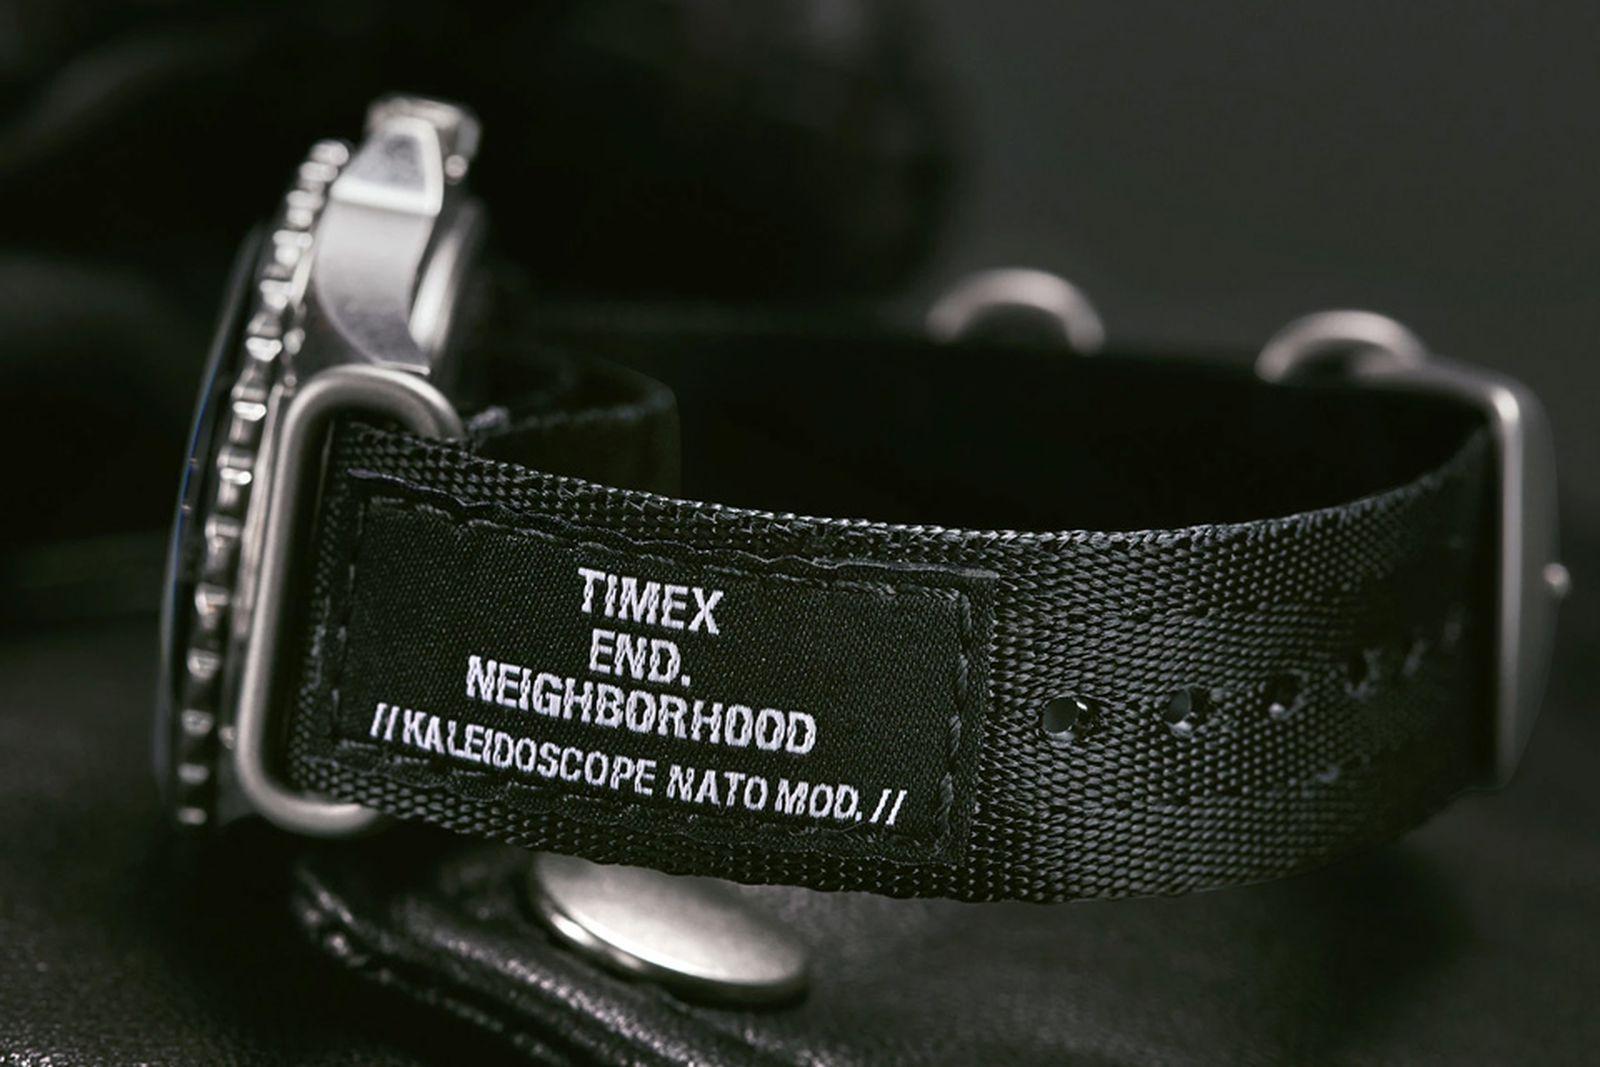 end time x neighborhood 18004 watch04 timex